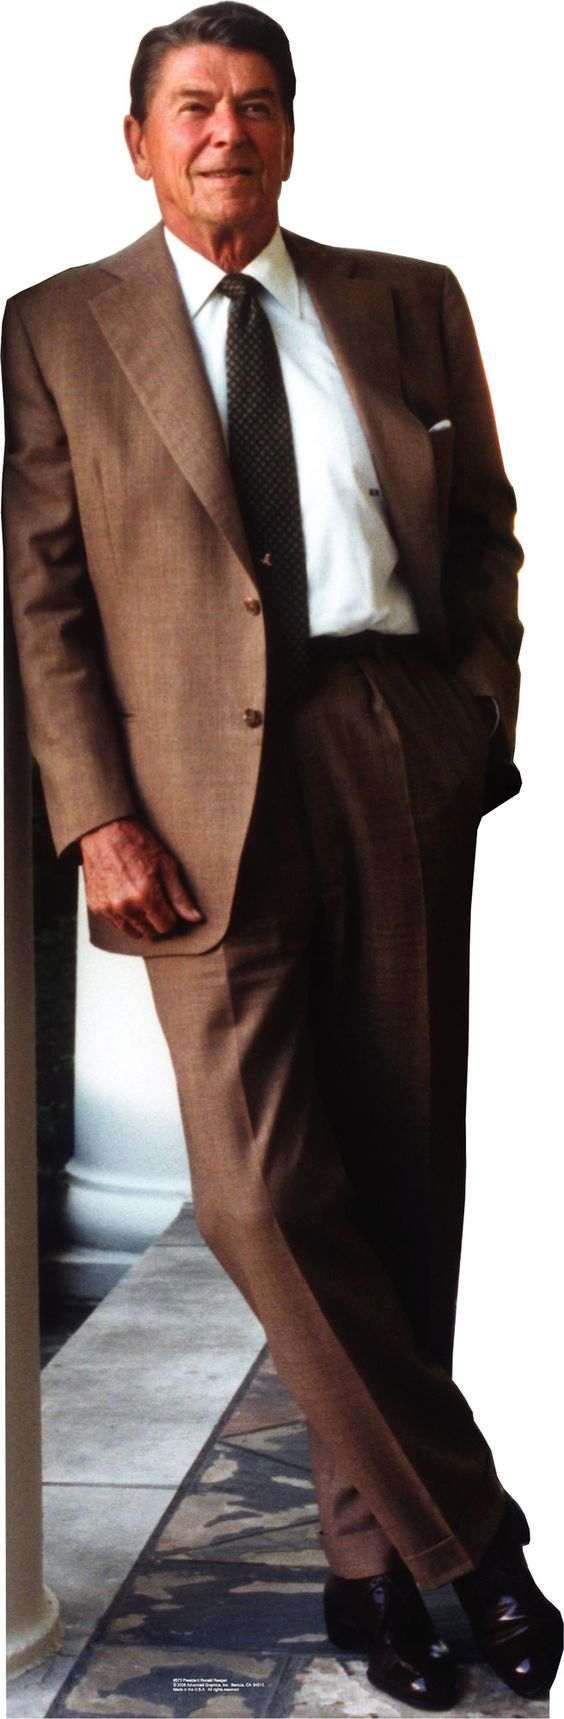 Patriotism and Politics President Ronald Reagan in Suit Cardboard